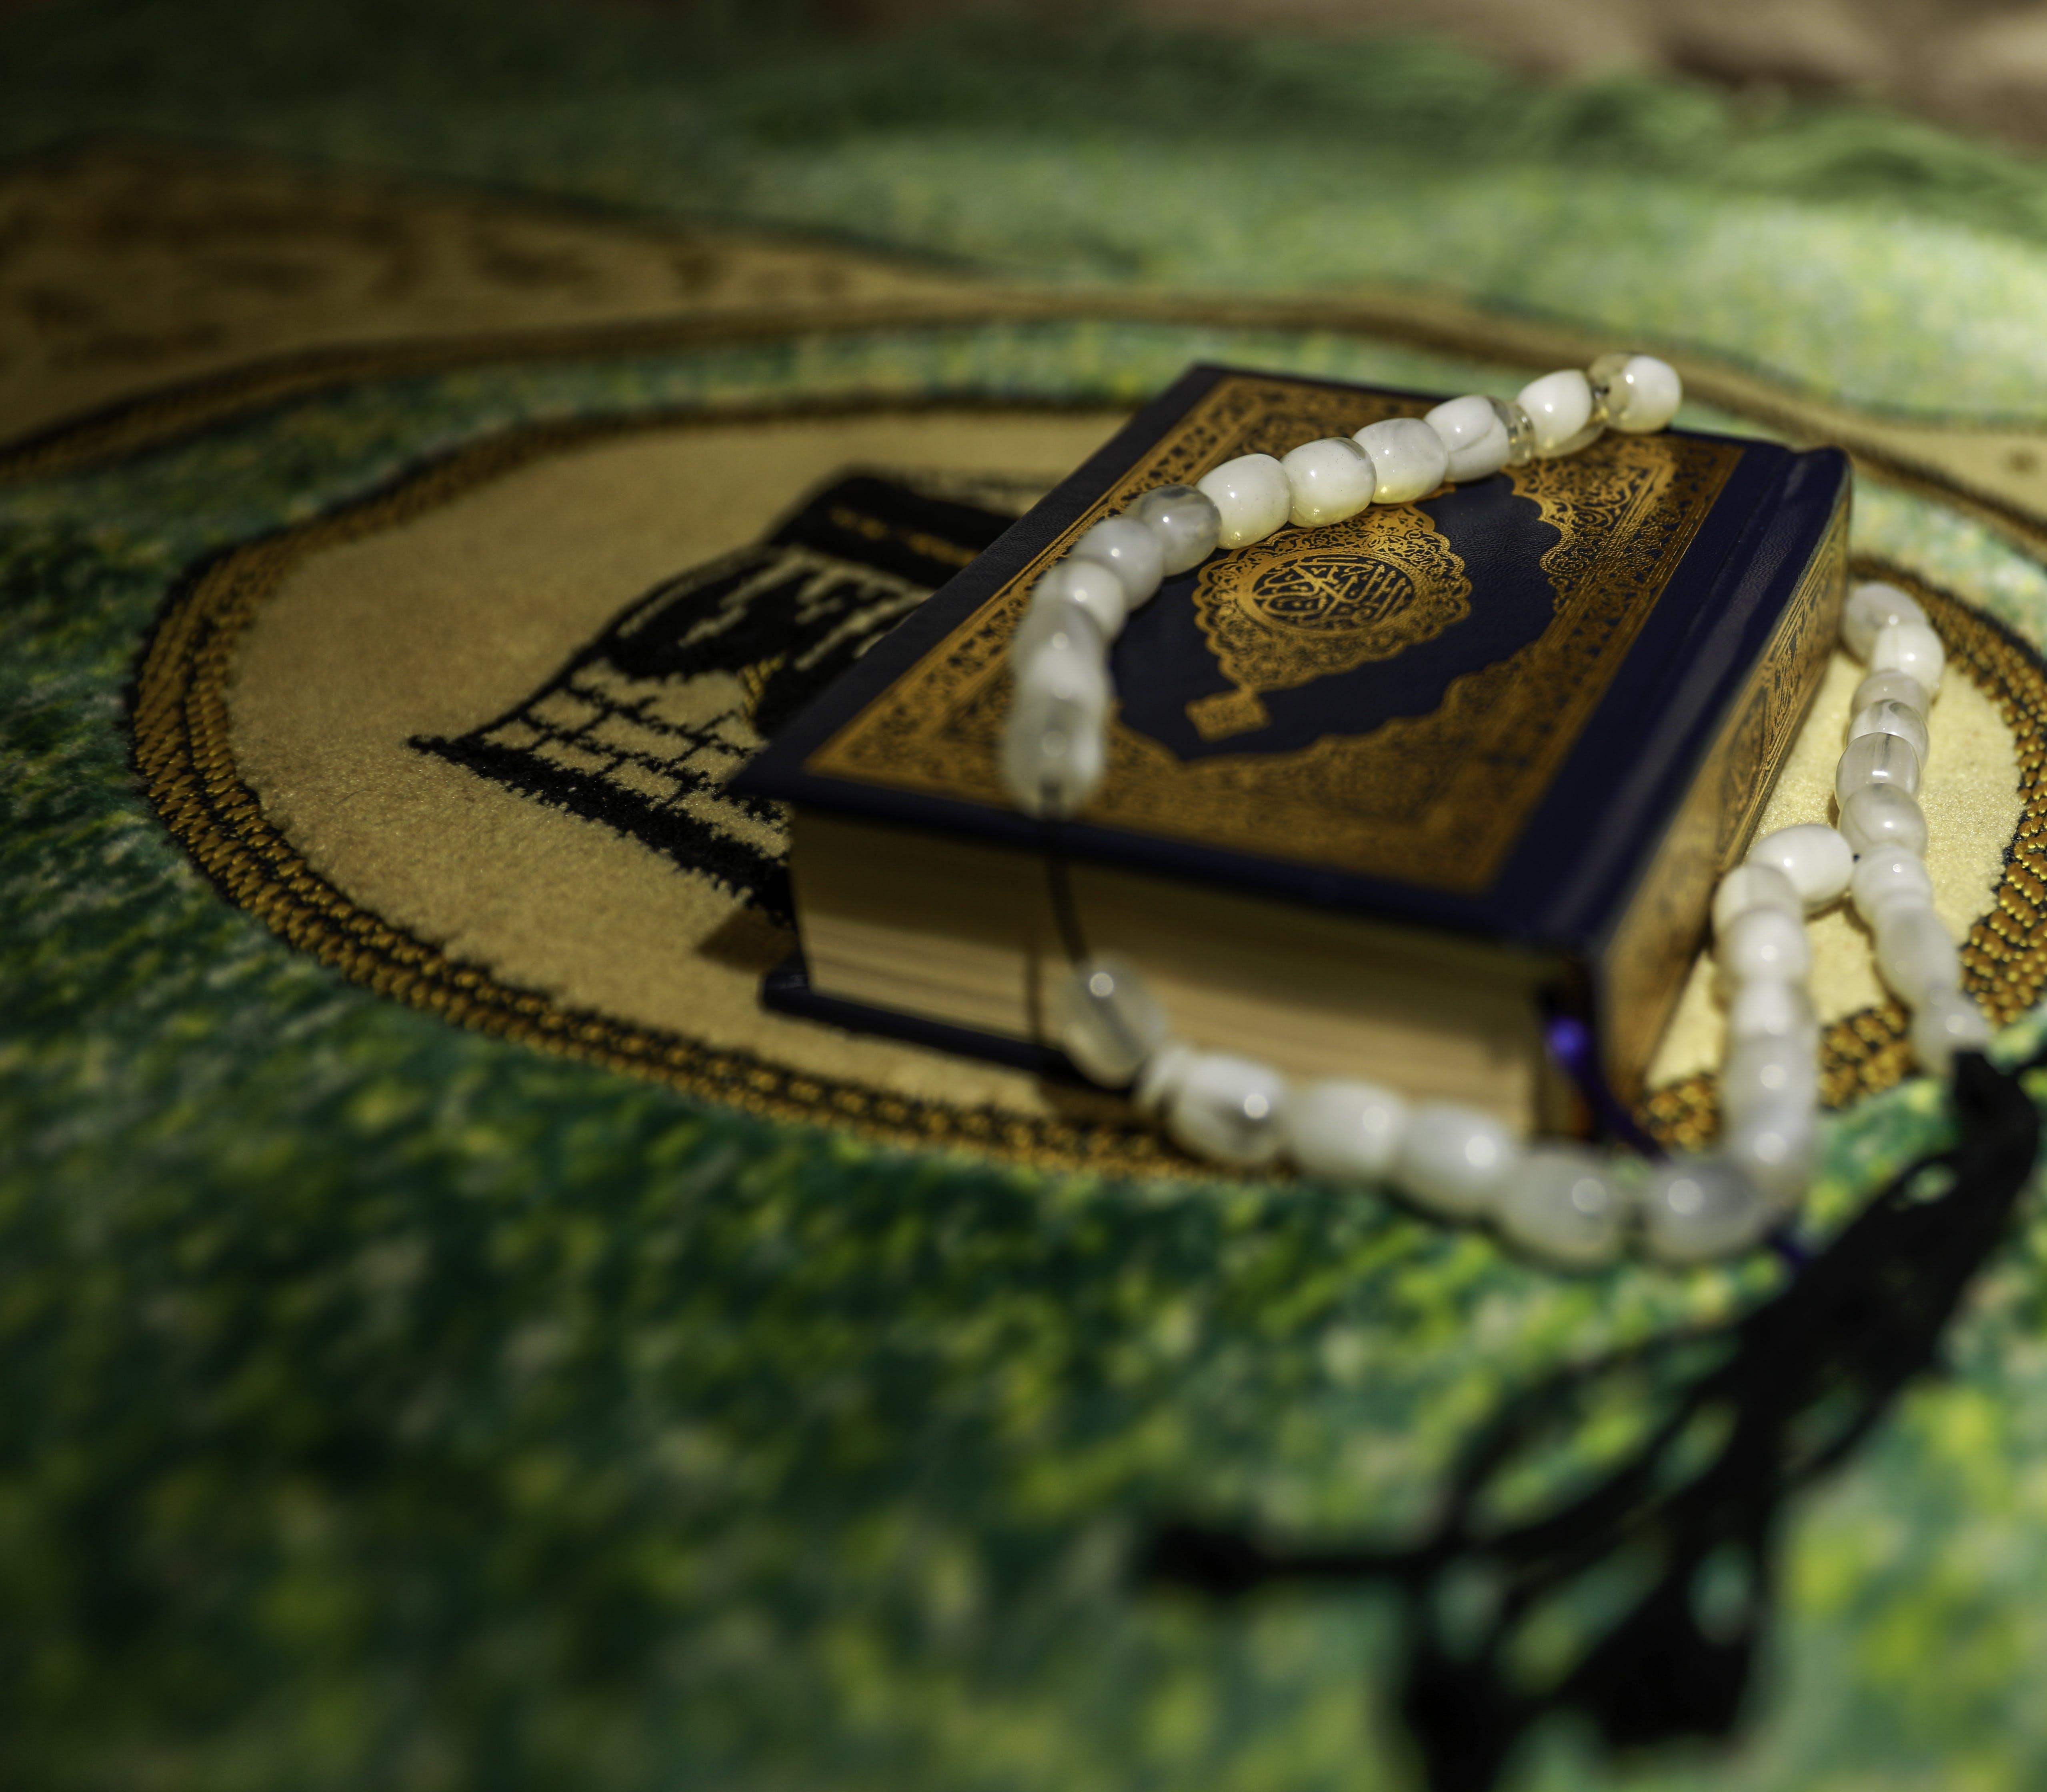 Free stock photo of Quran